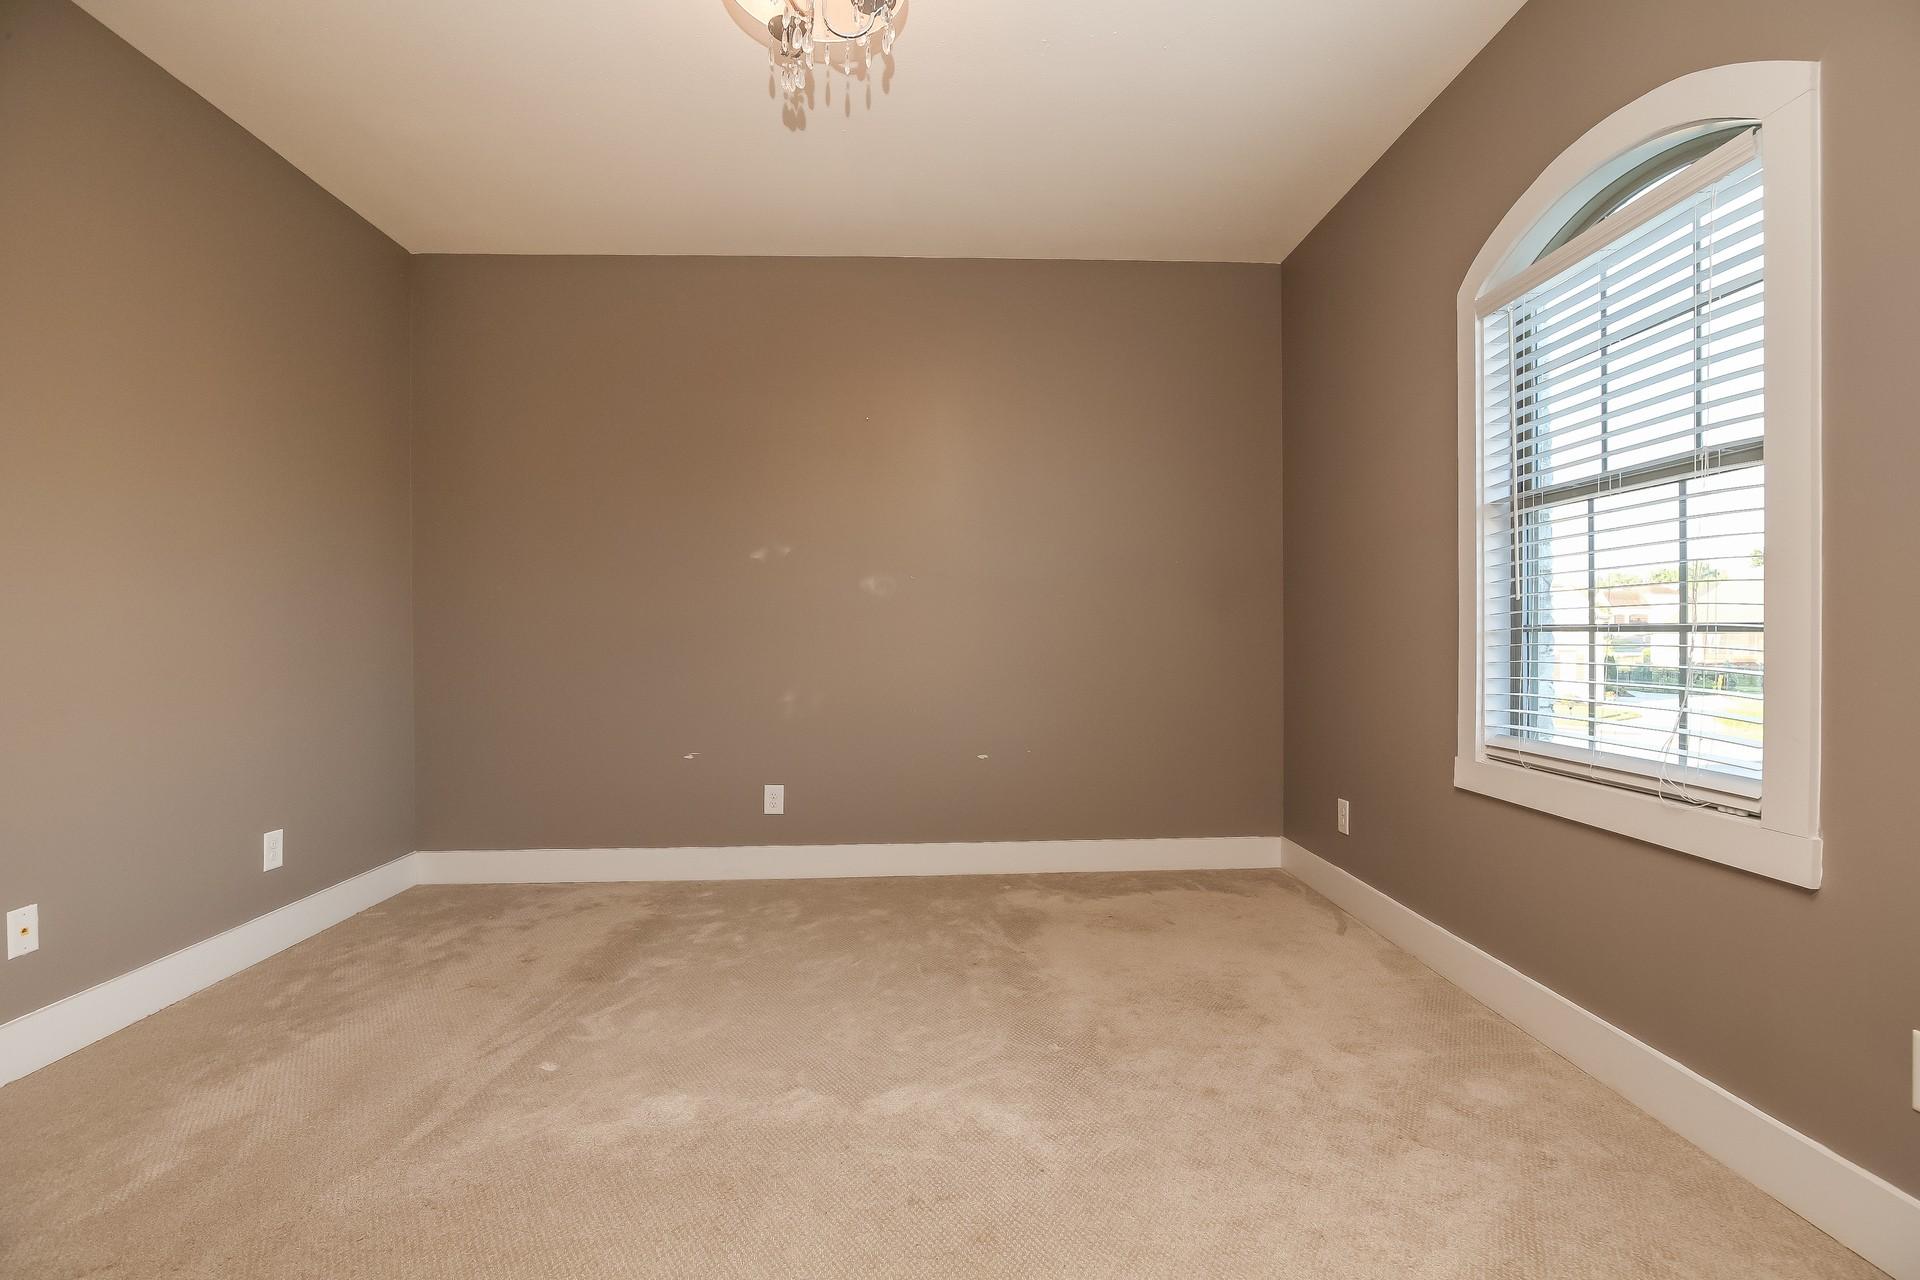 259 Harrowgate Dr Property Photo 21